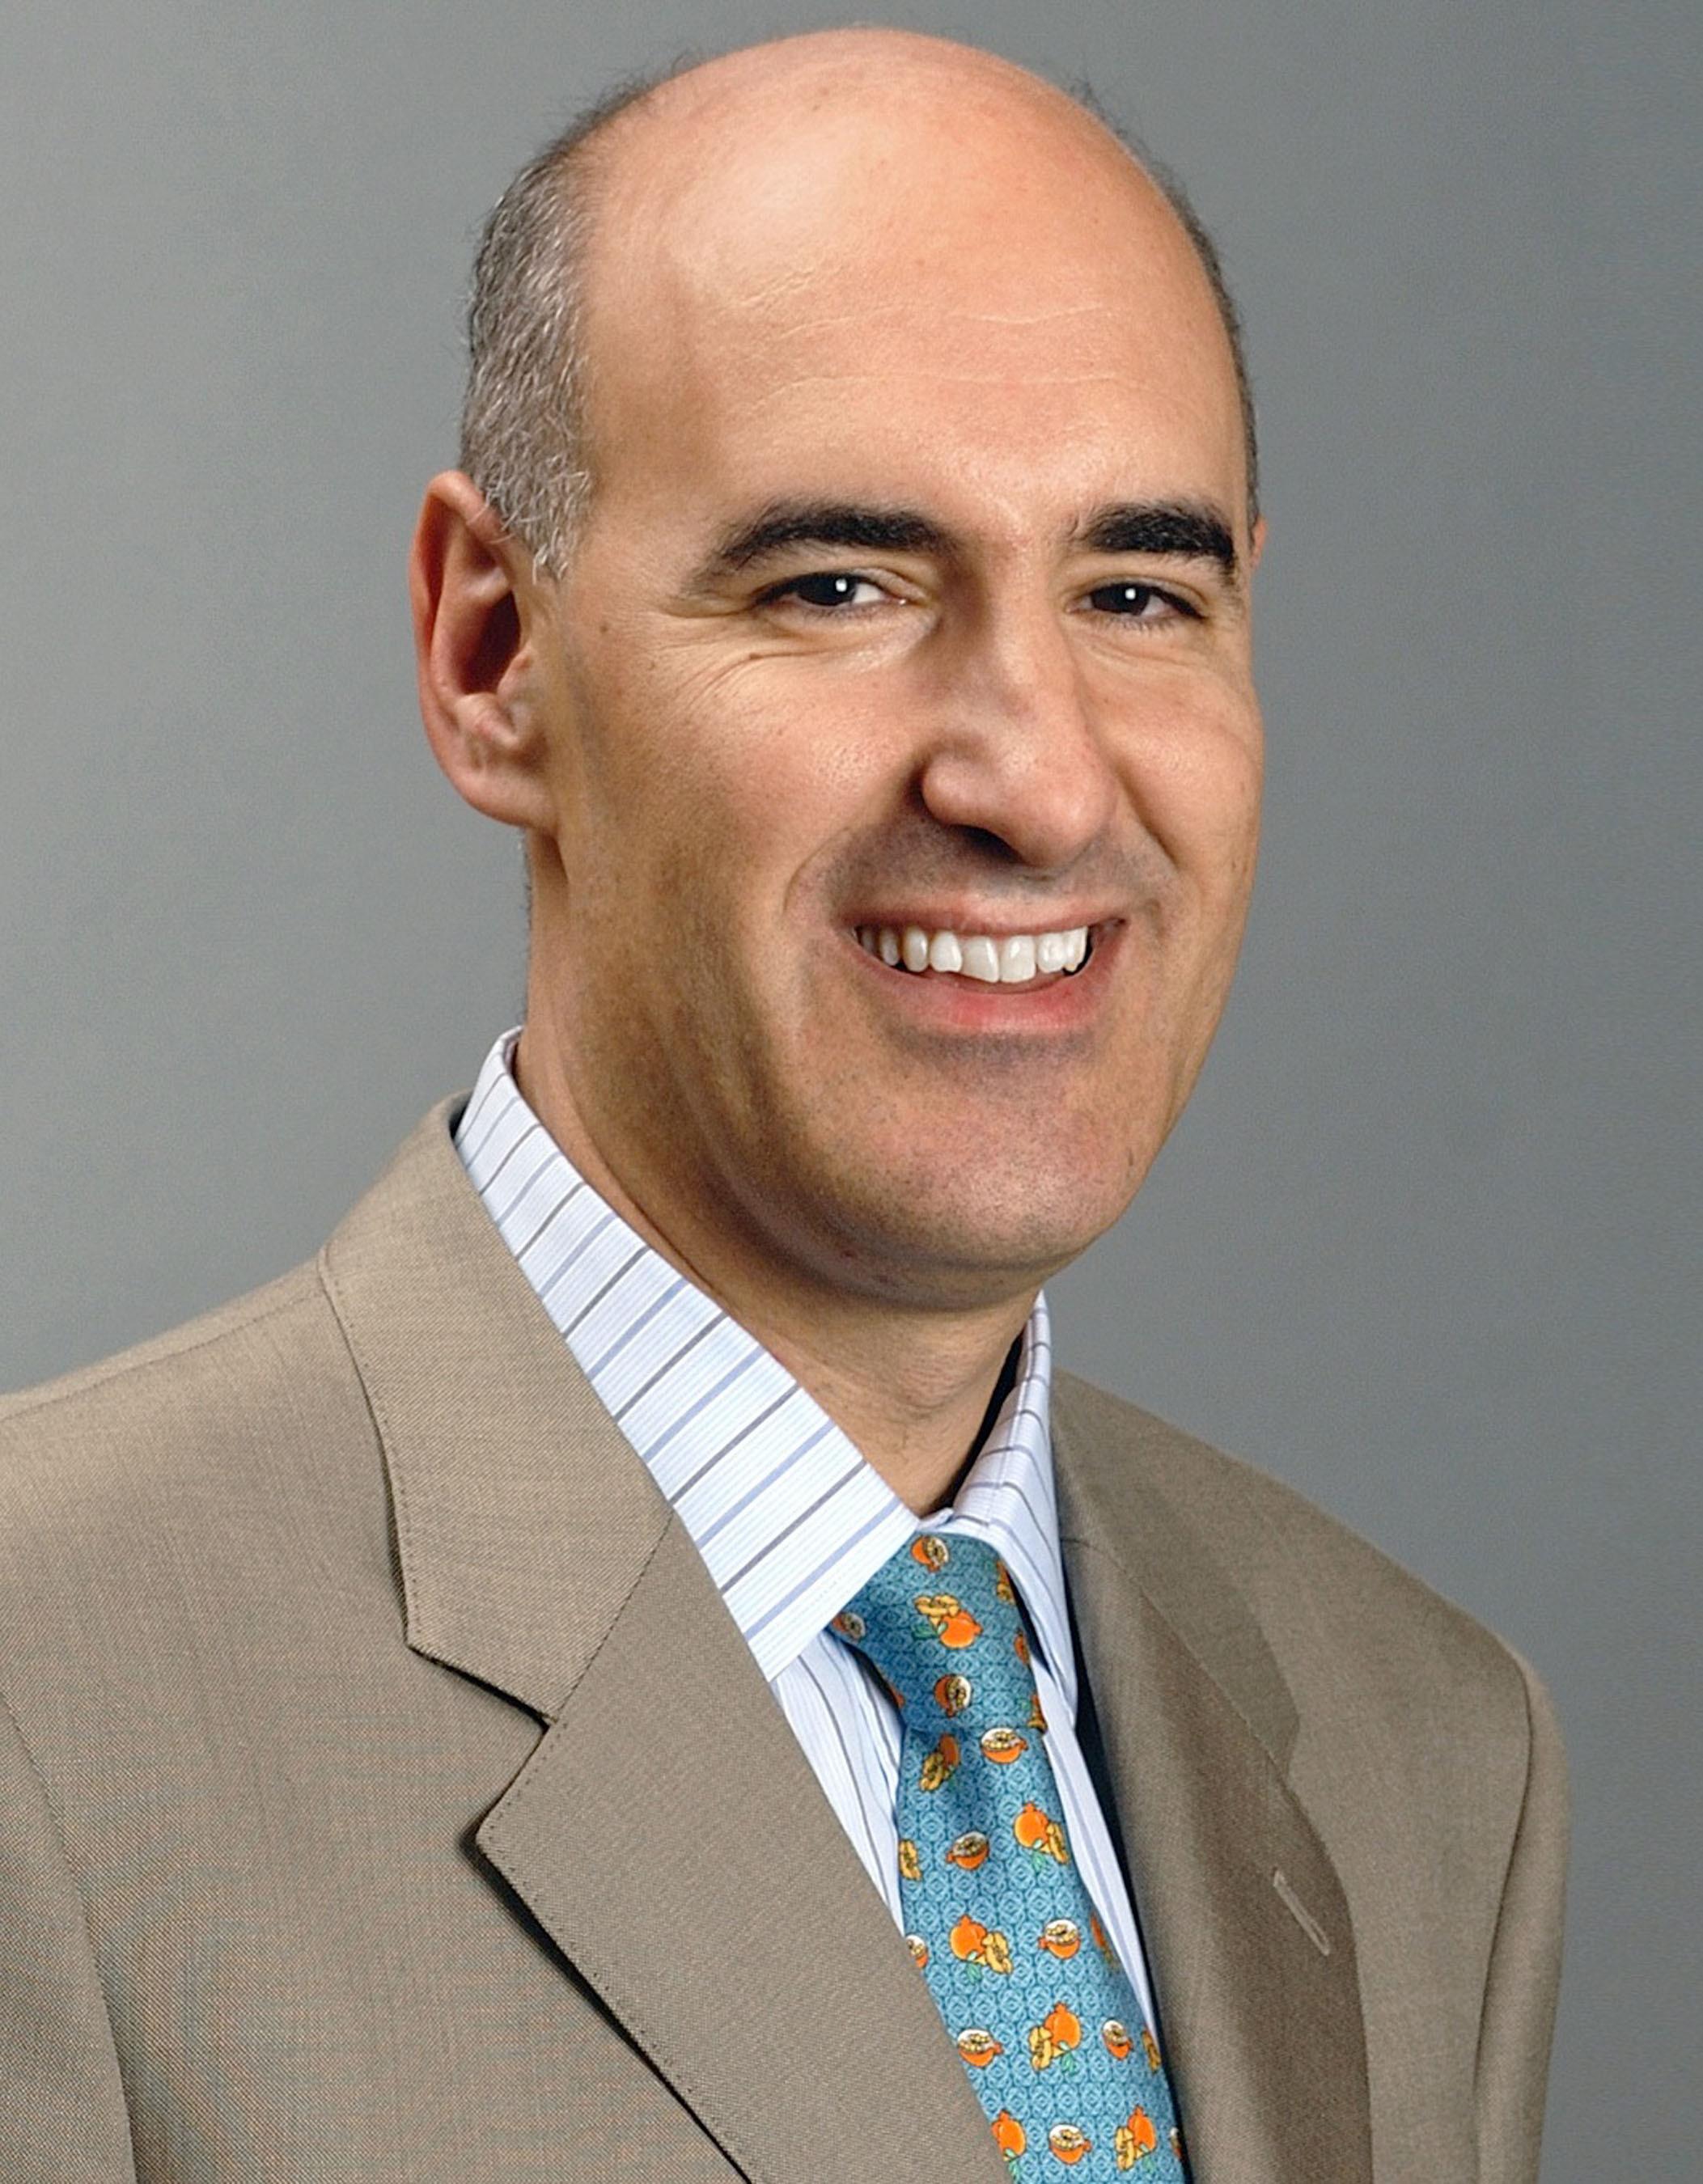 Mauro F. Guillen, Director, The Lauder Institute. (PRNewsFoto/Lauder Institute) (PRNewsFoto/LAUDER INSTITUTE)